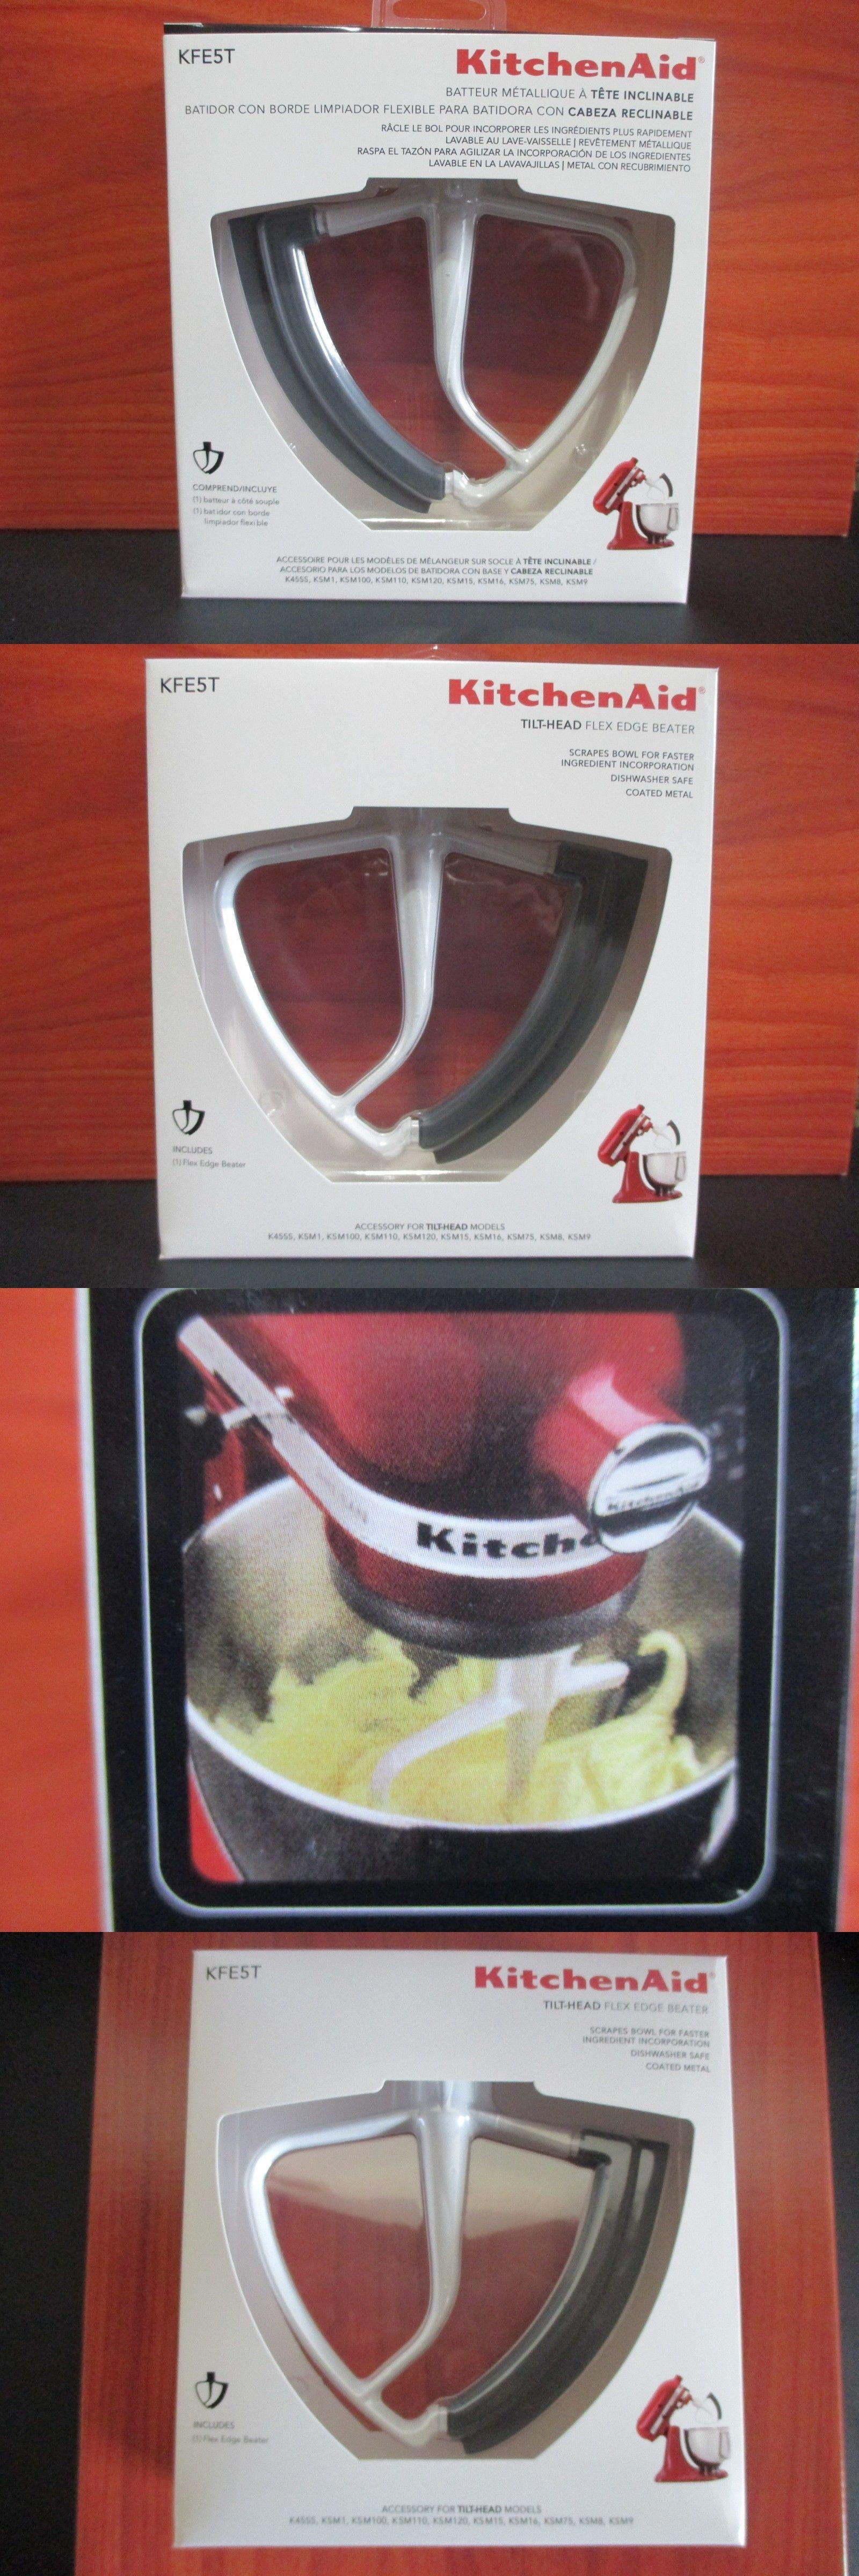 Countertop blenders 133704 kitchen aid kfe5t flex edge